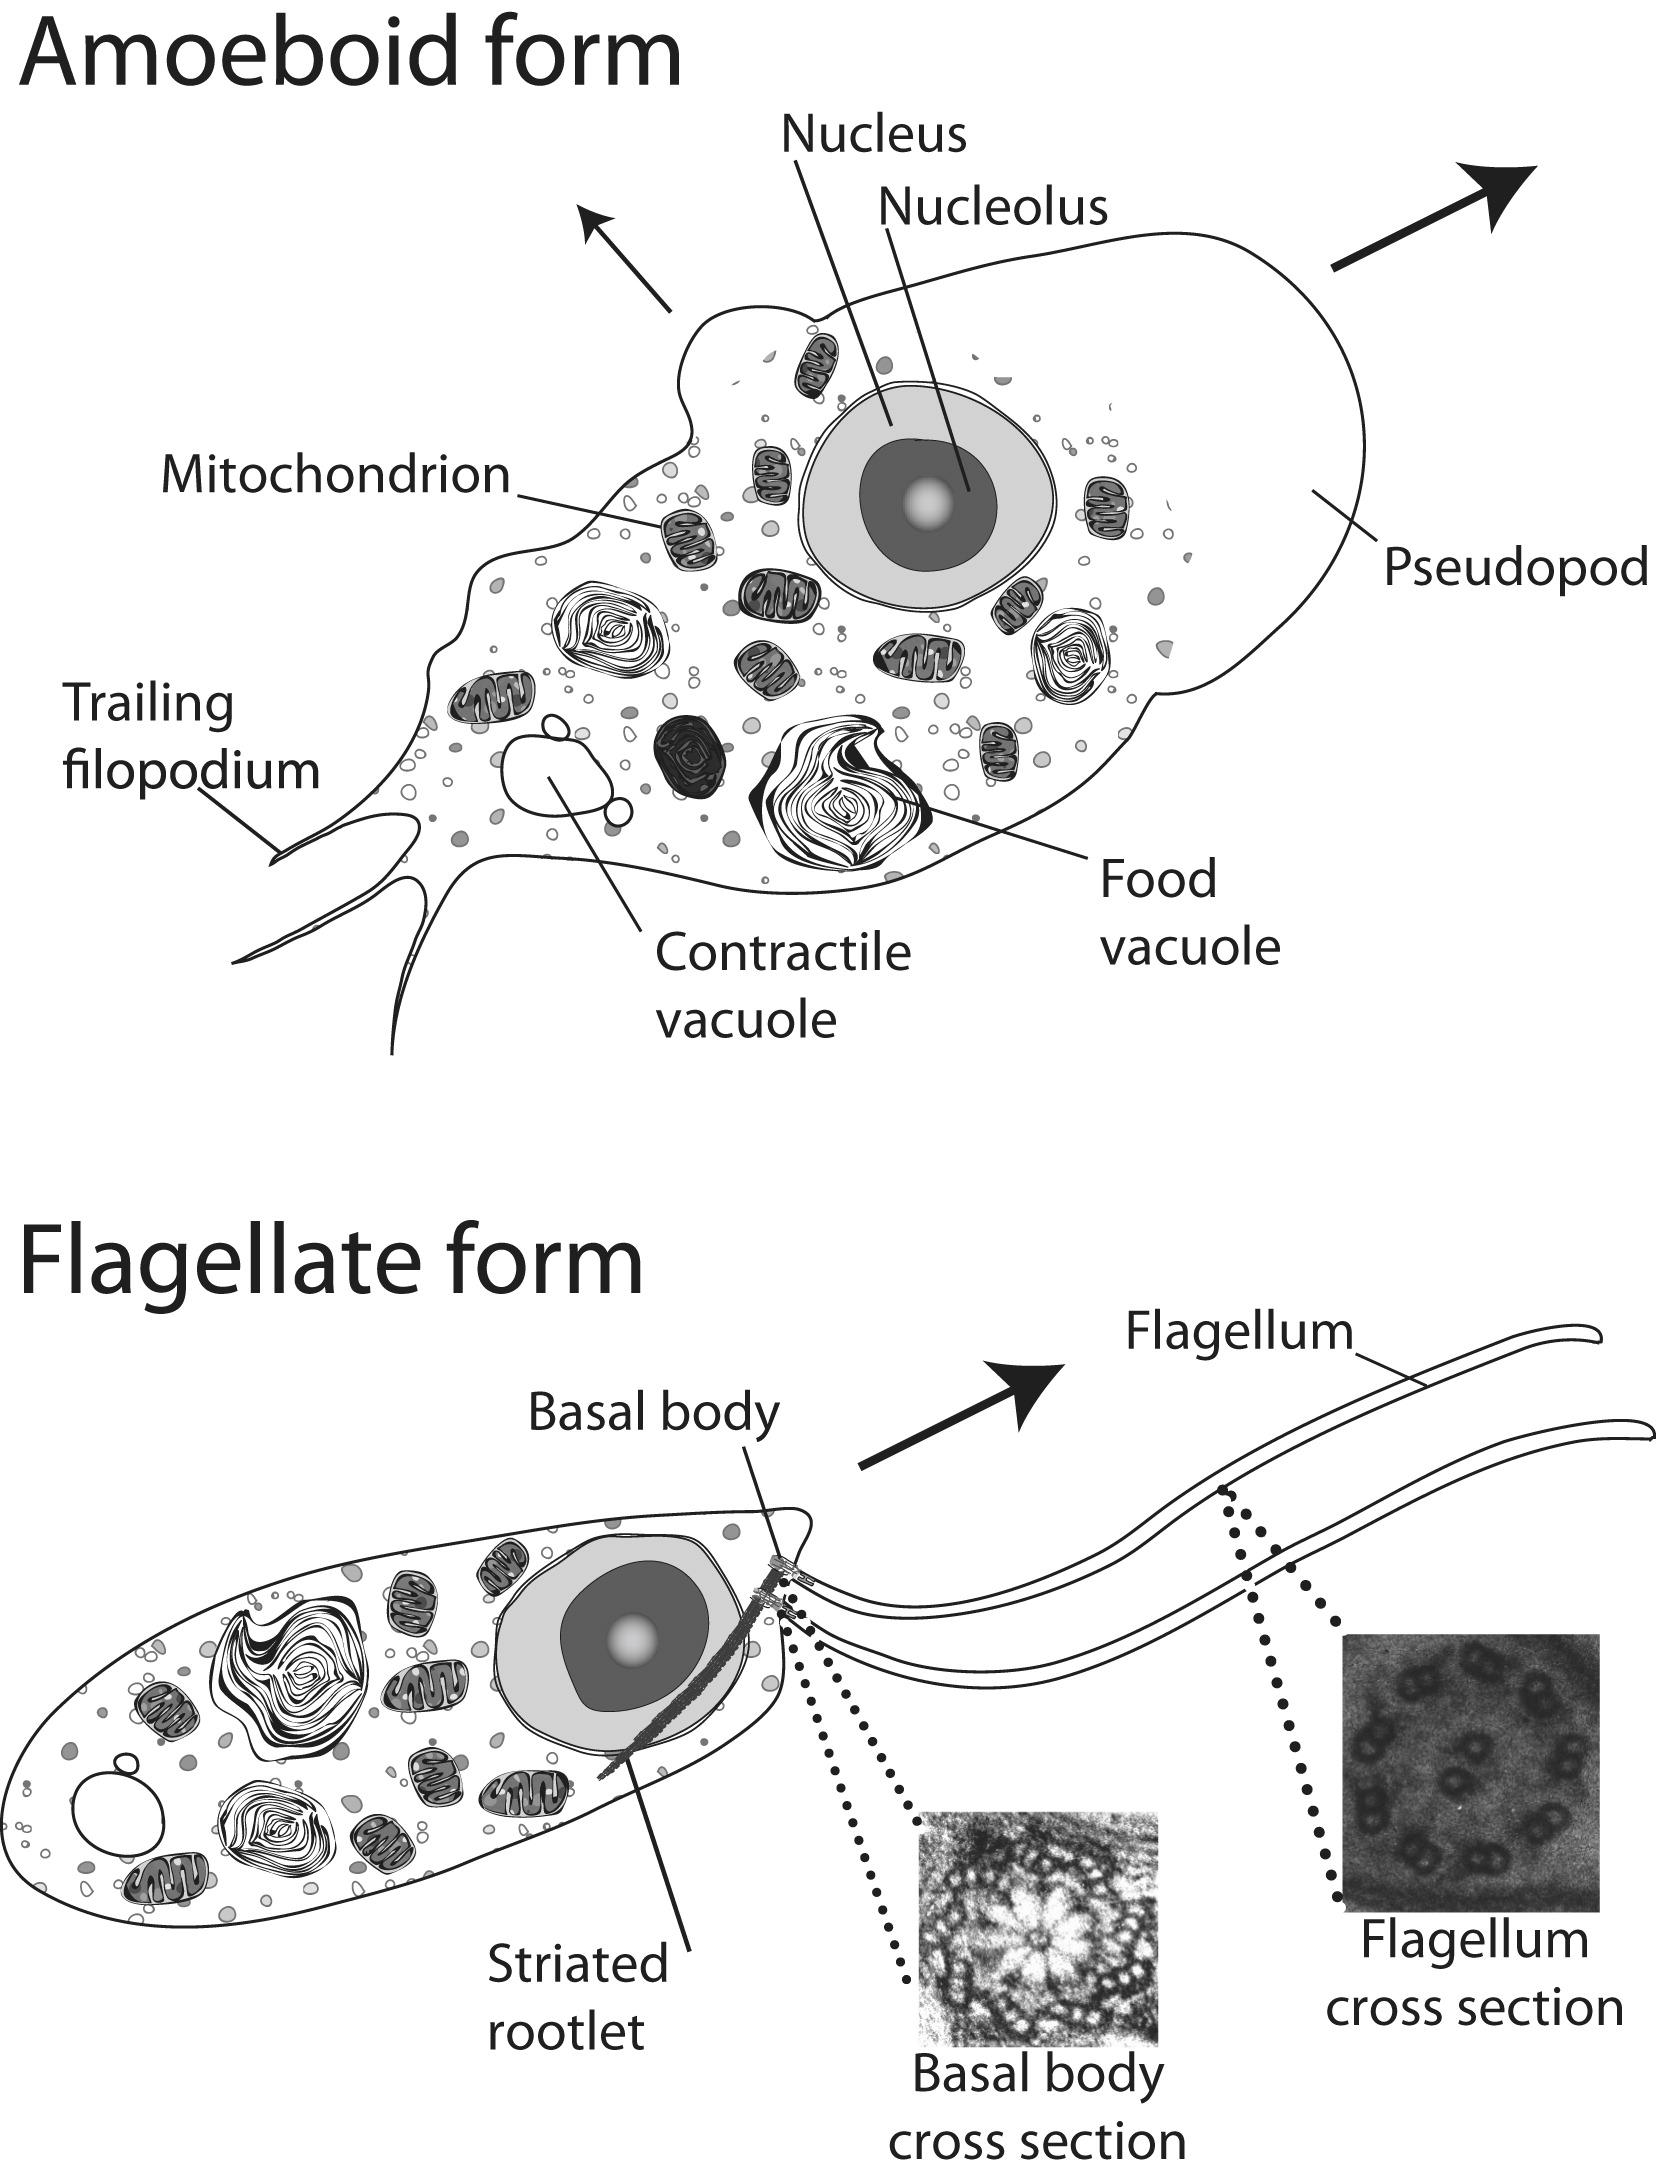 The Genome Of Naegleria Gruberi Illuminates Early